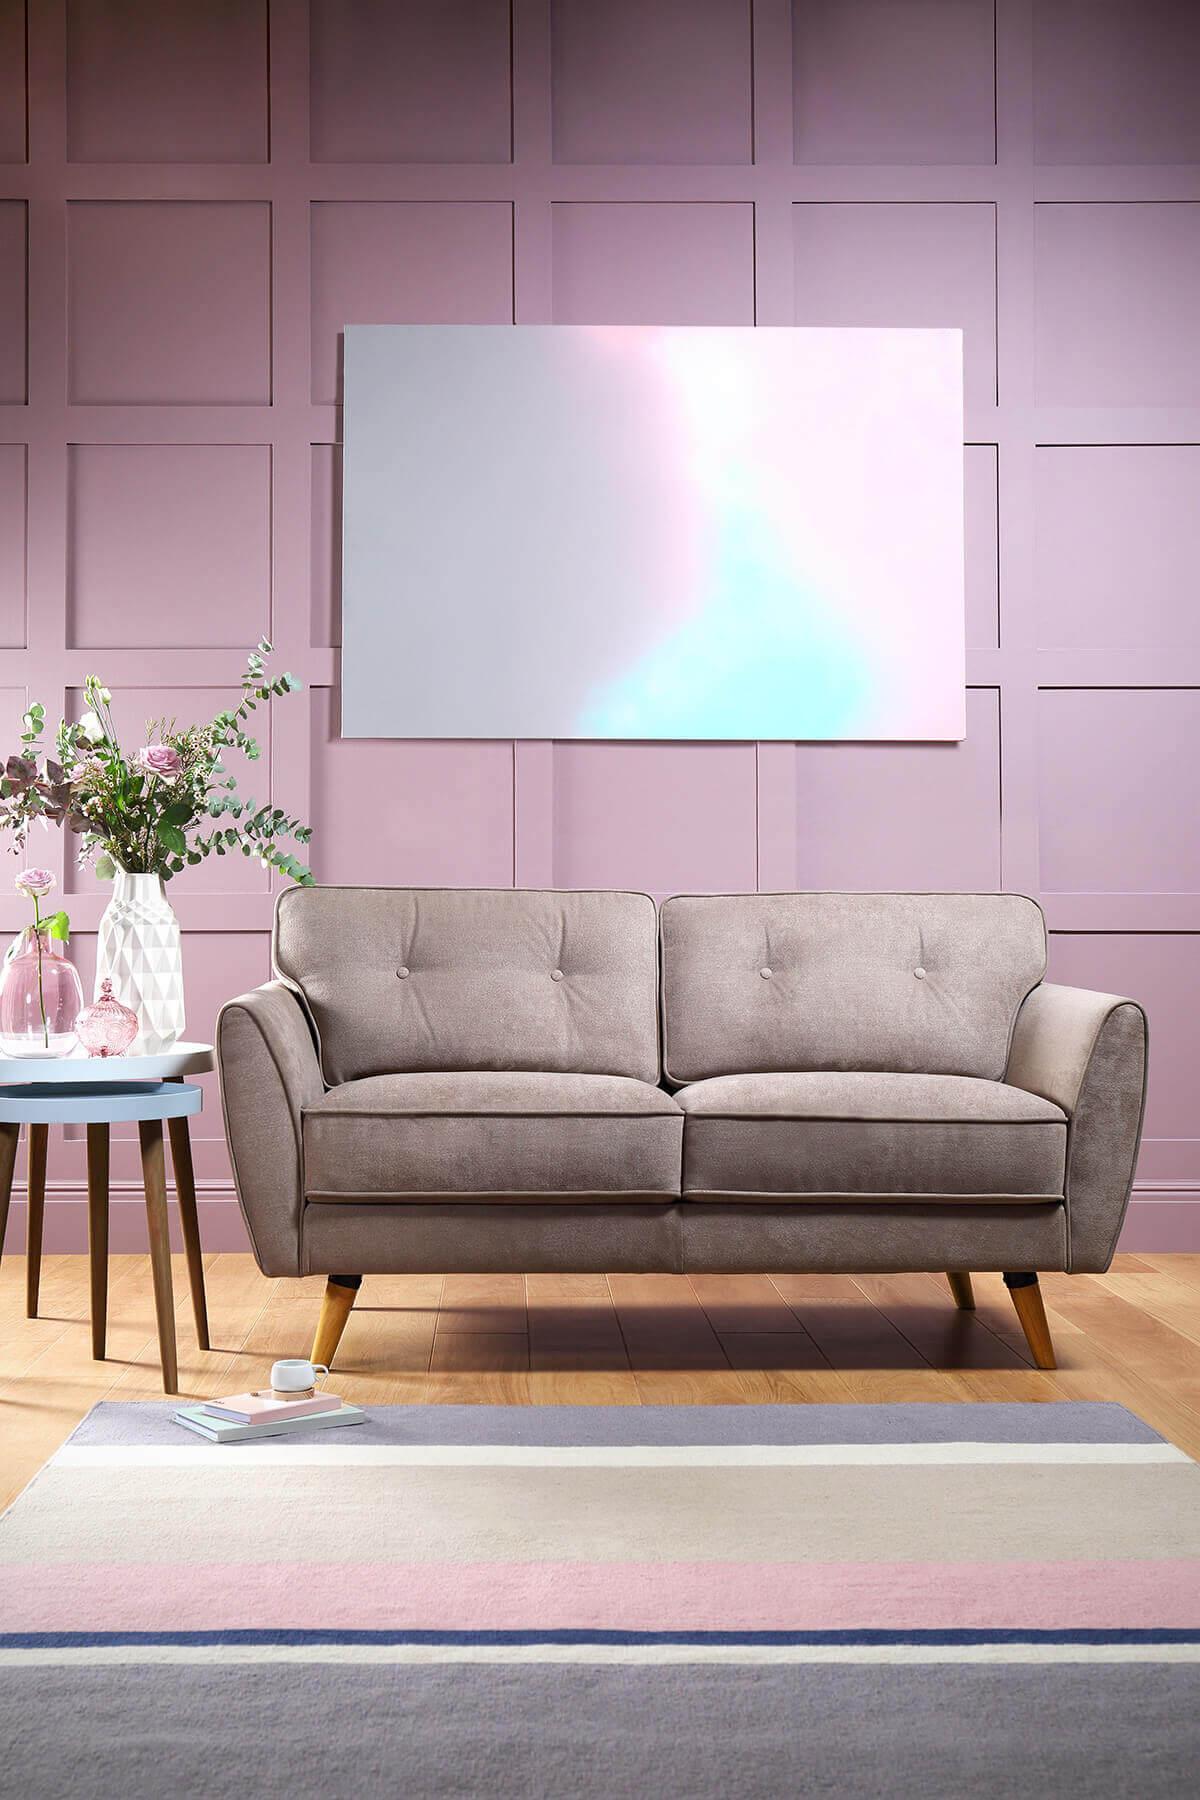 Harlow Oatmeal Fabric Sofa - 2 Seater